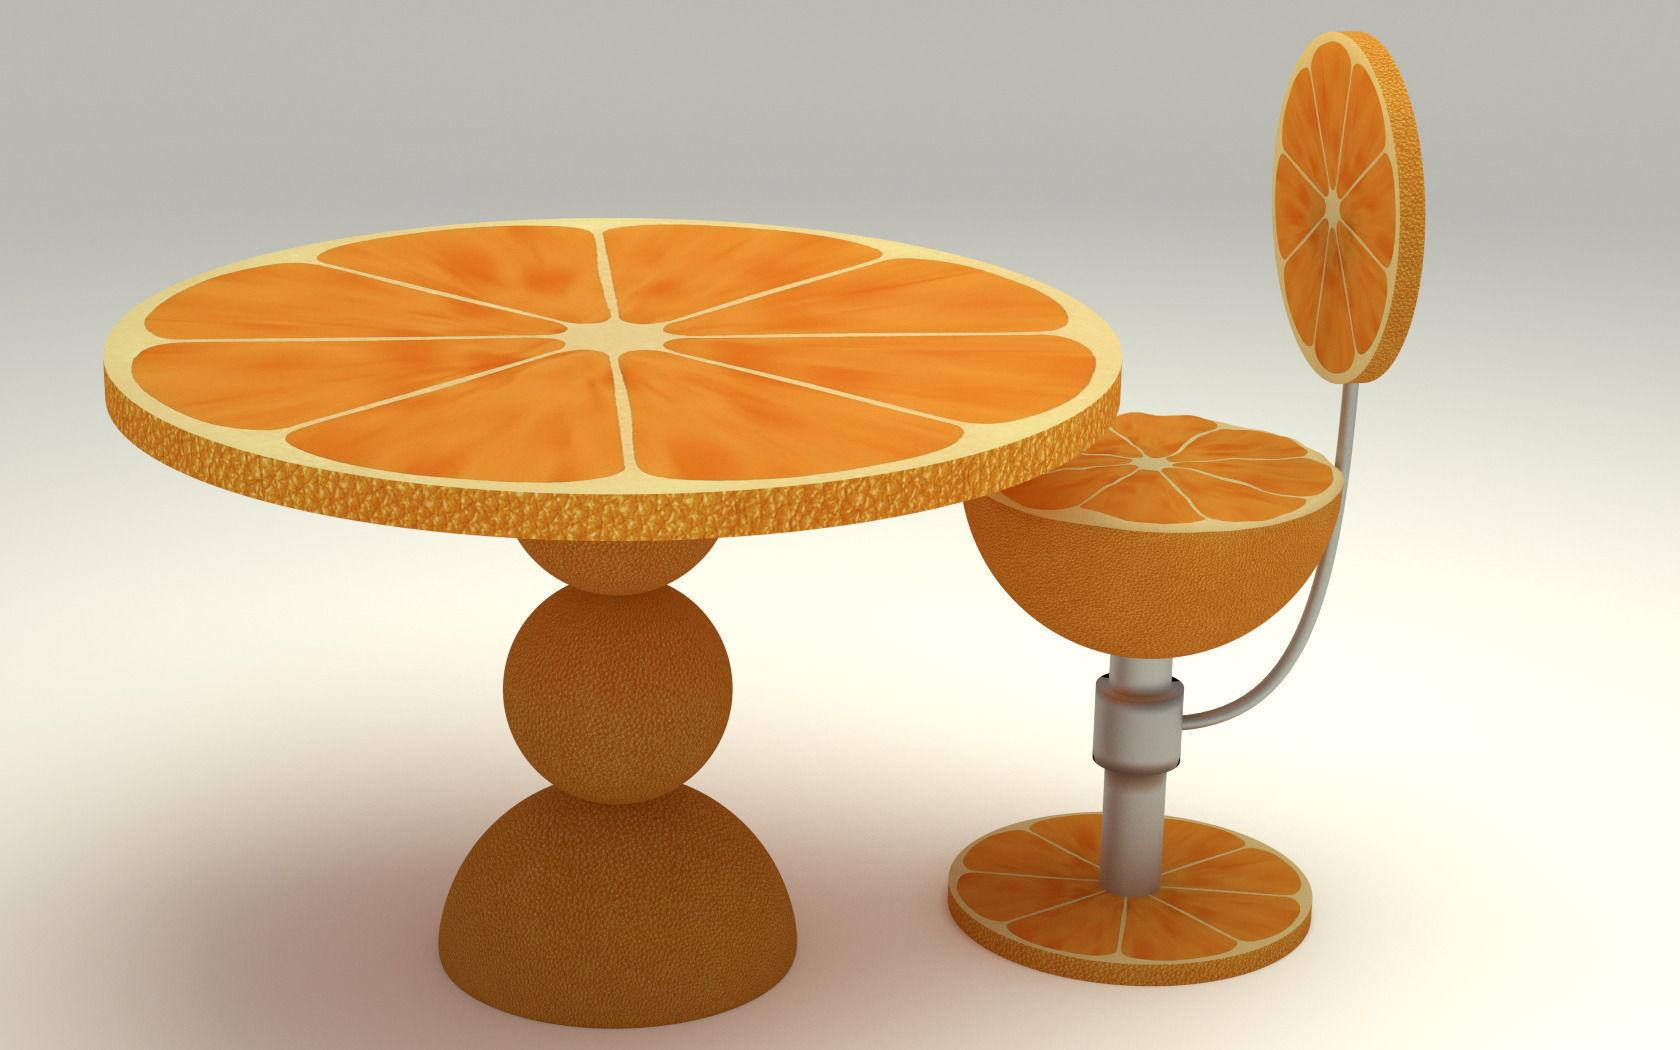 orange kitchen table 3d model max obj fbx c4d ma mb blend